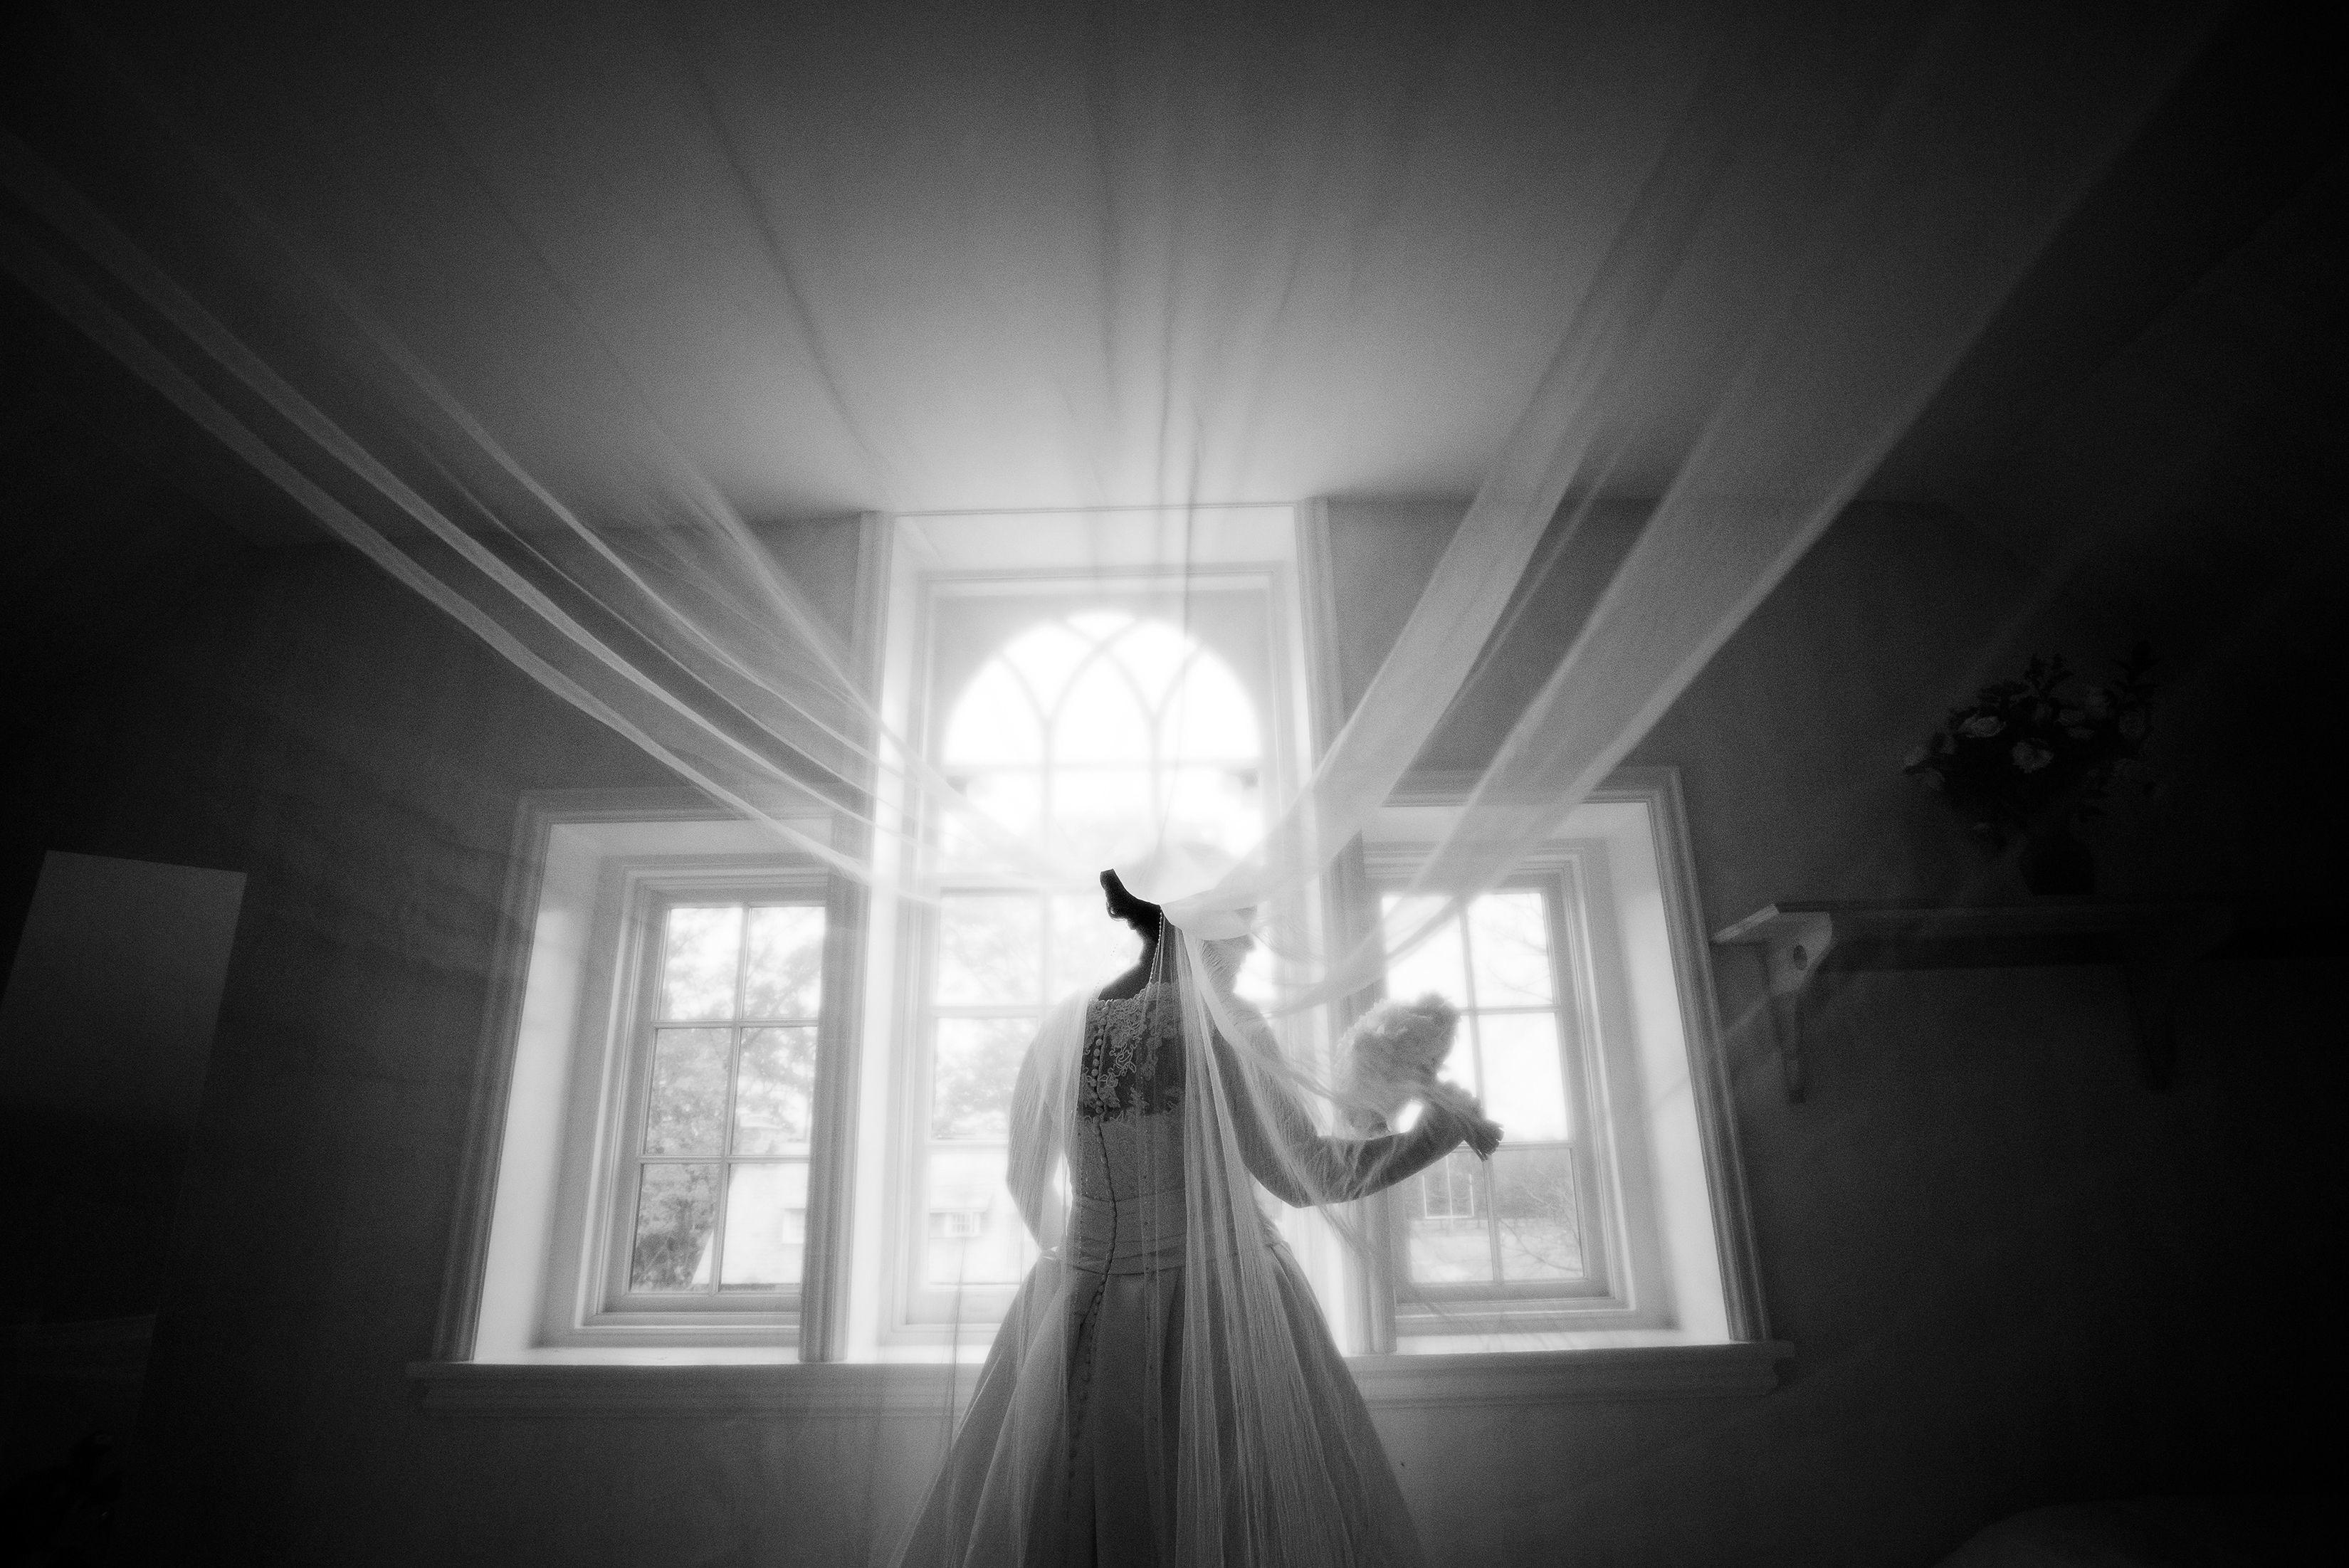 Bride Kiera Murasko-Blank prepares for her wedding at her parents´ East Falls home.